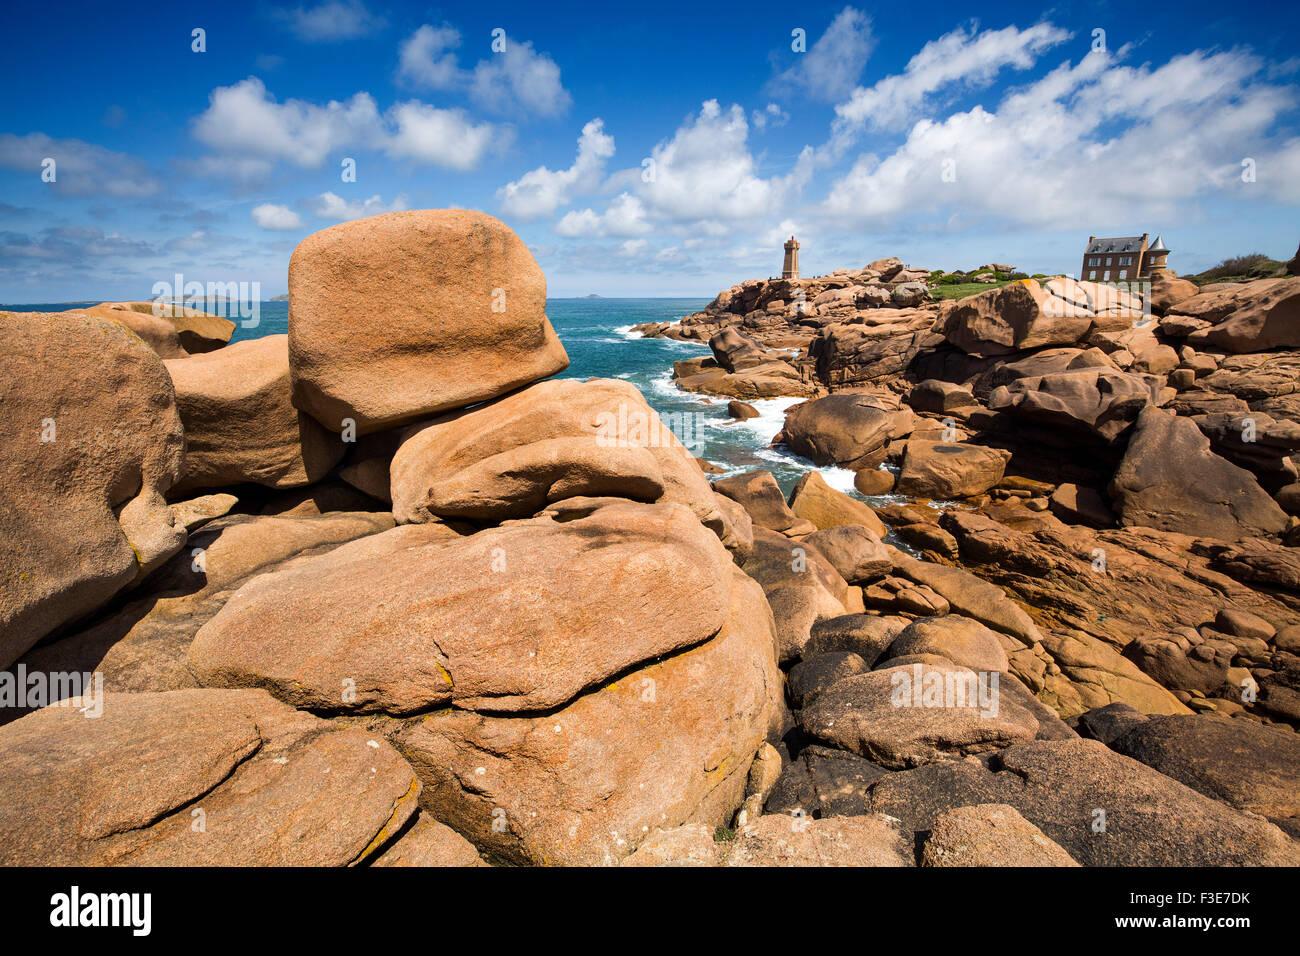 Phare de Mean Ruz lighthouse giant rocks at the Cote granit rose pink granite coast Ploumanac´h Perros Guirec - Stock Image